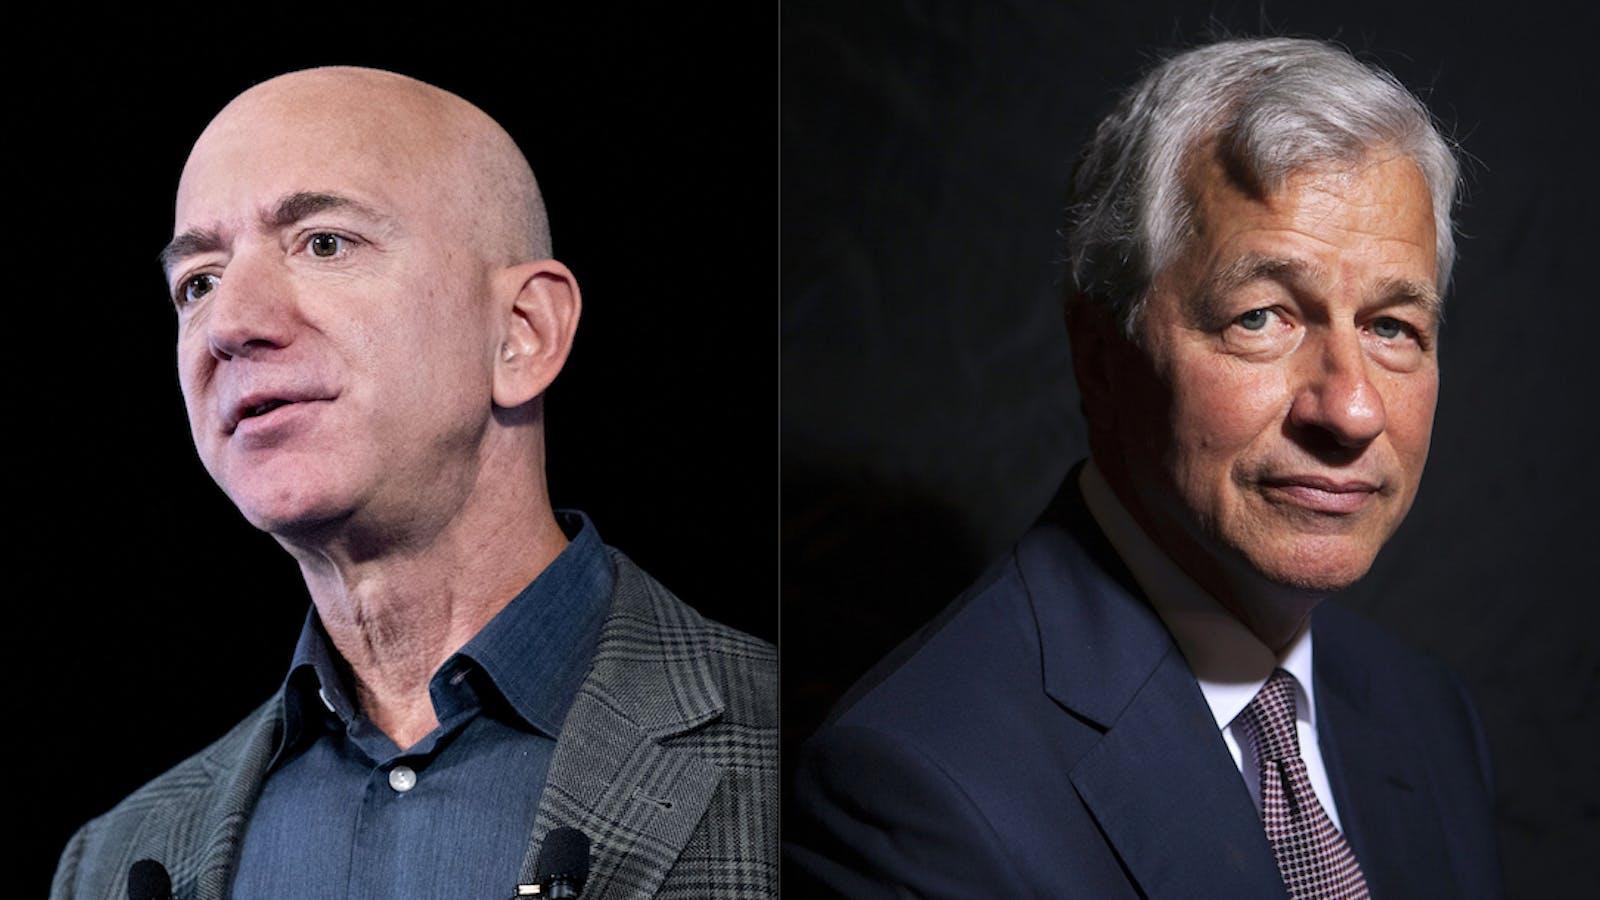 Amazon CEO Jeff Bezos and JPMorgan Chase CEO Jamie Dimon. Photos by Bloomberg